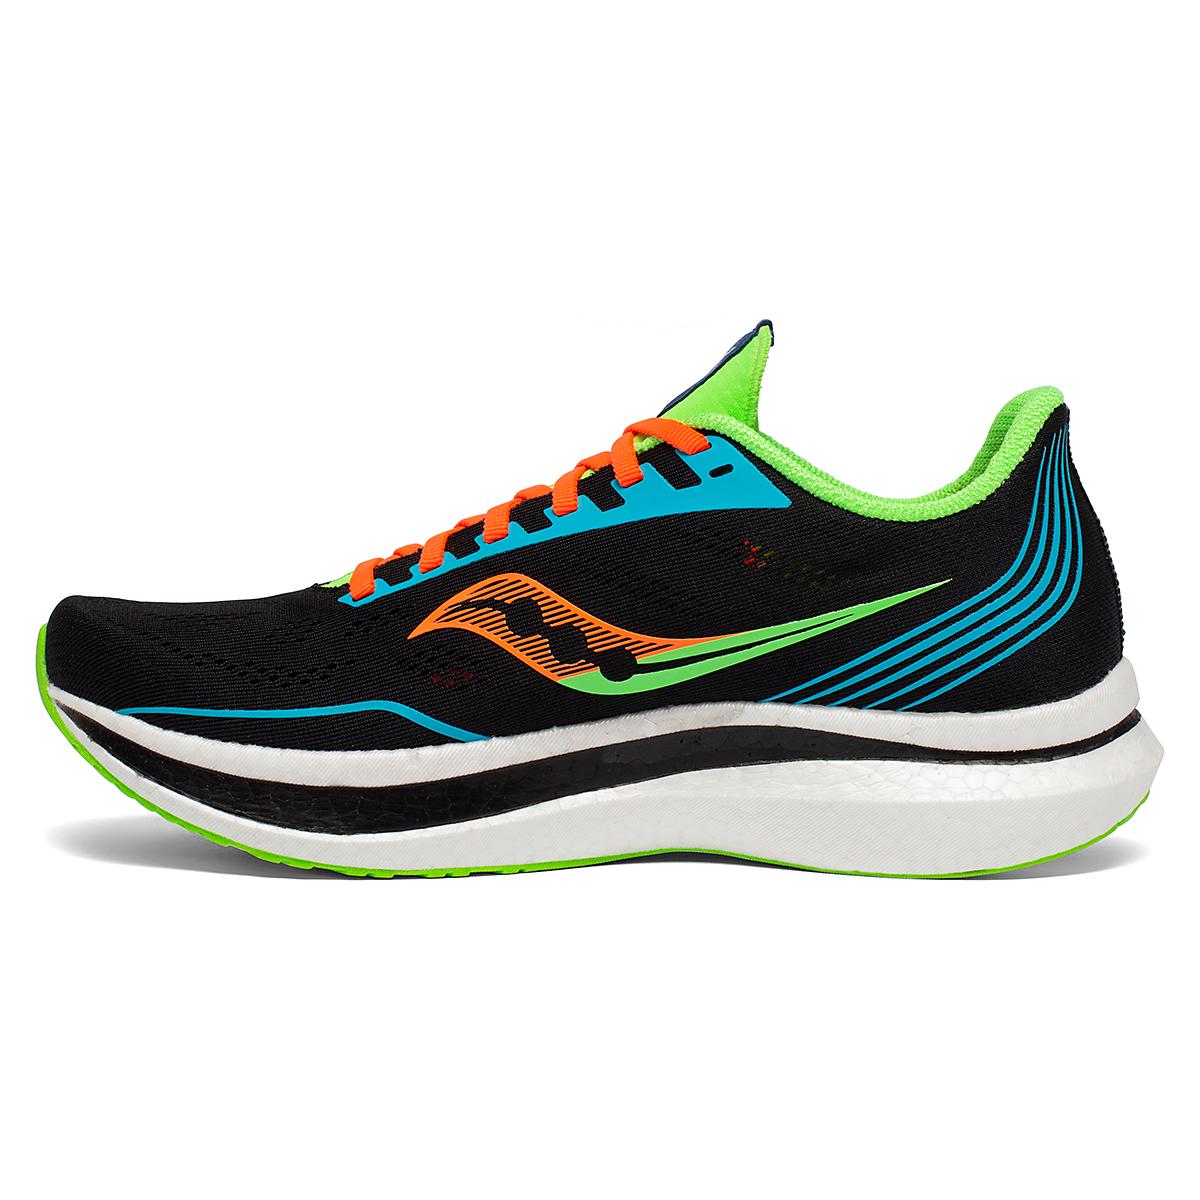 Men's Saucony Endorphin Pro Running Shoe - Color: Future/Black - Size: 7 - Width: Regular, Future/Black, large, image 2